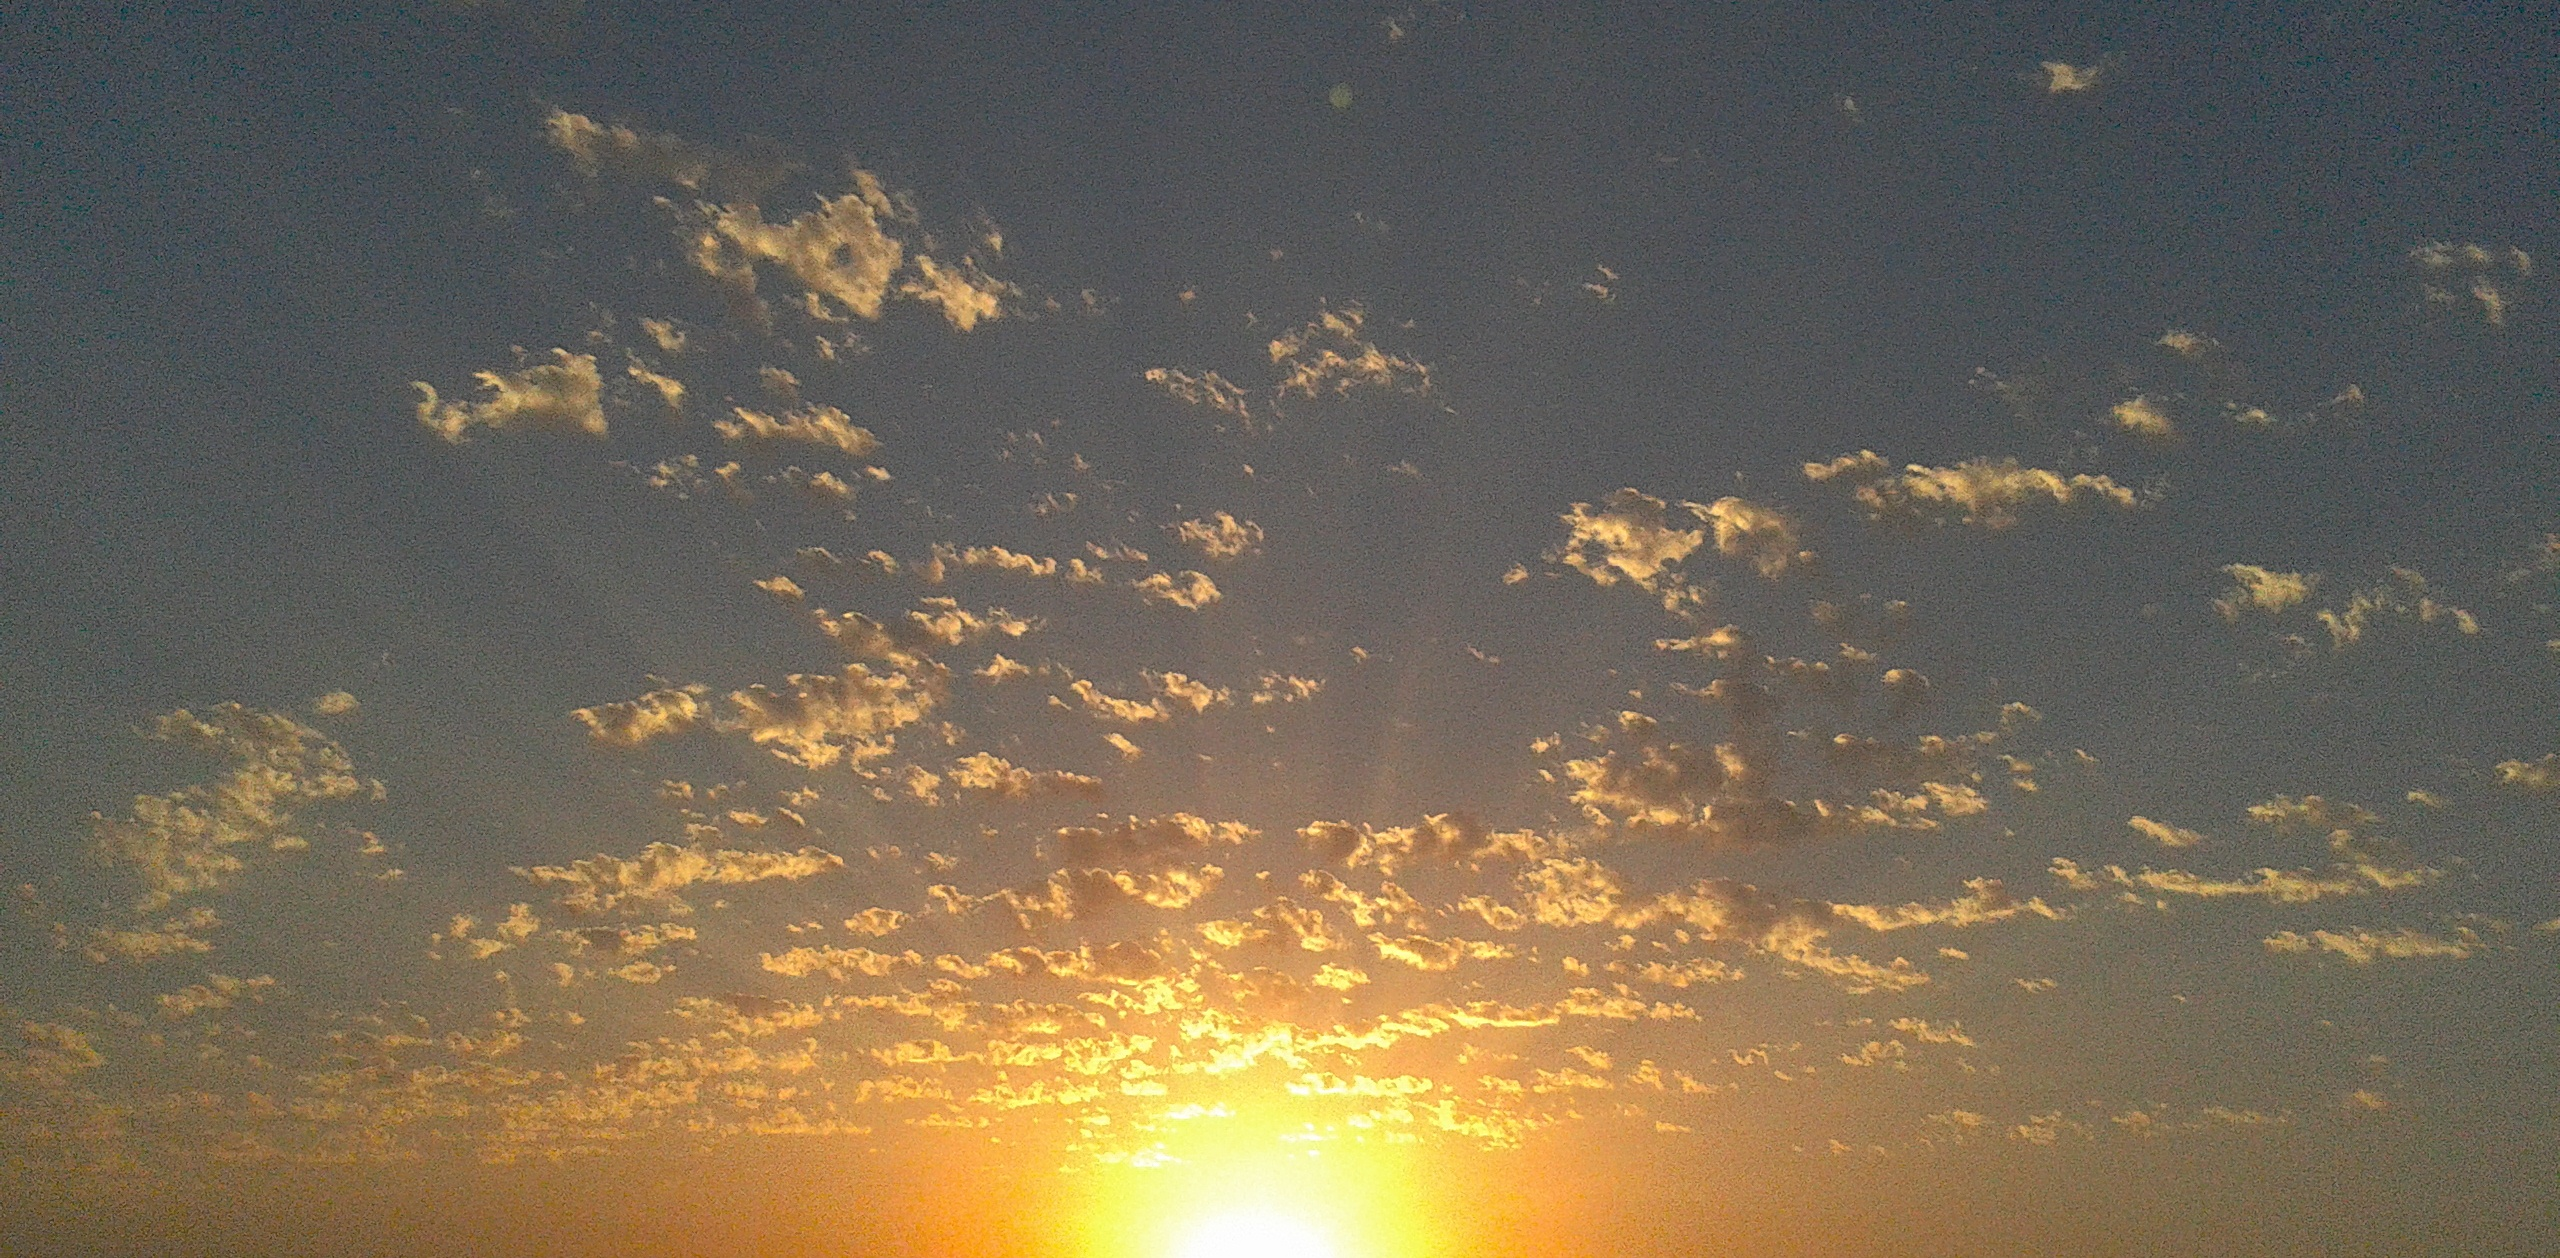 Above us, the same sky